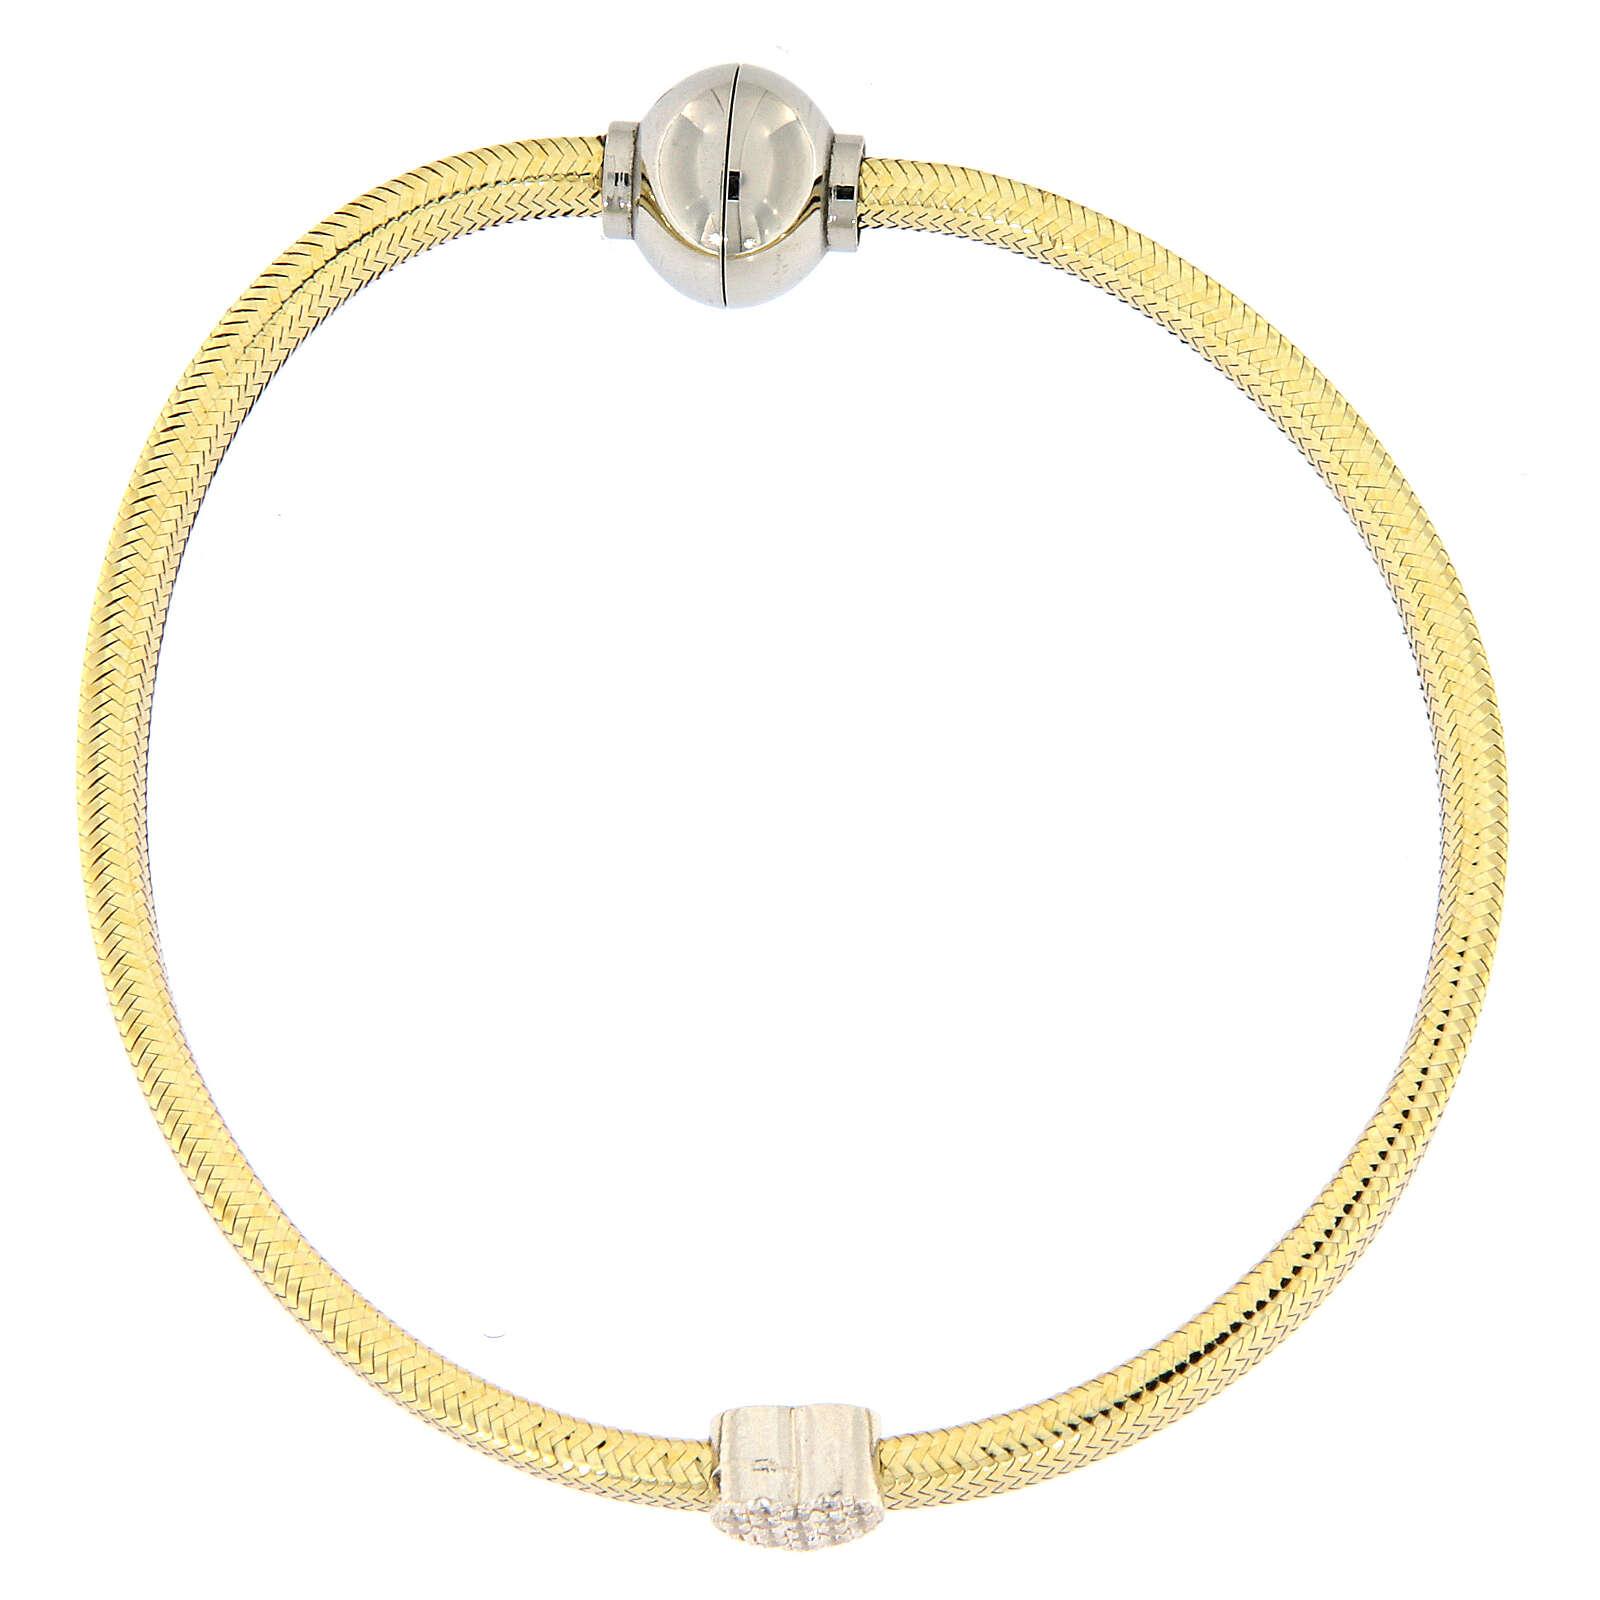 Bracciale AMEN lurex oro charm argento 925 zirconi 4